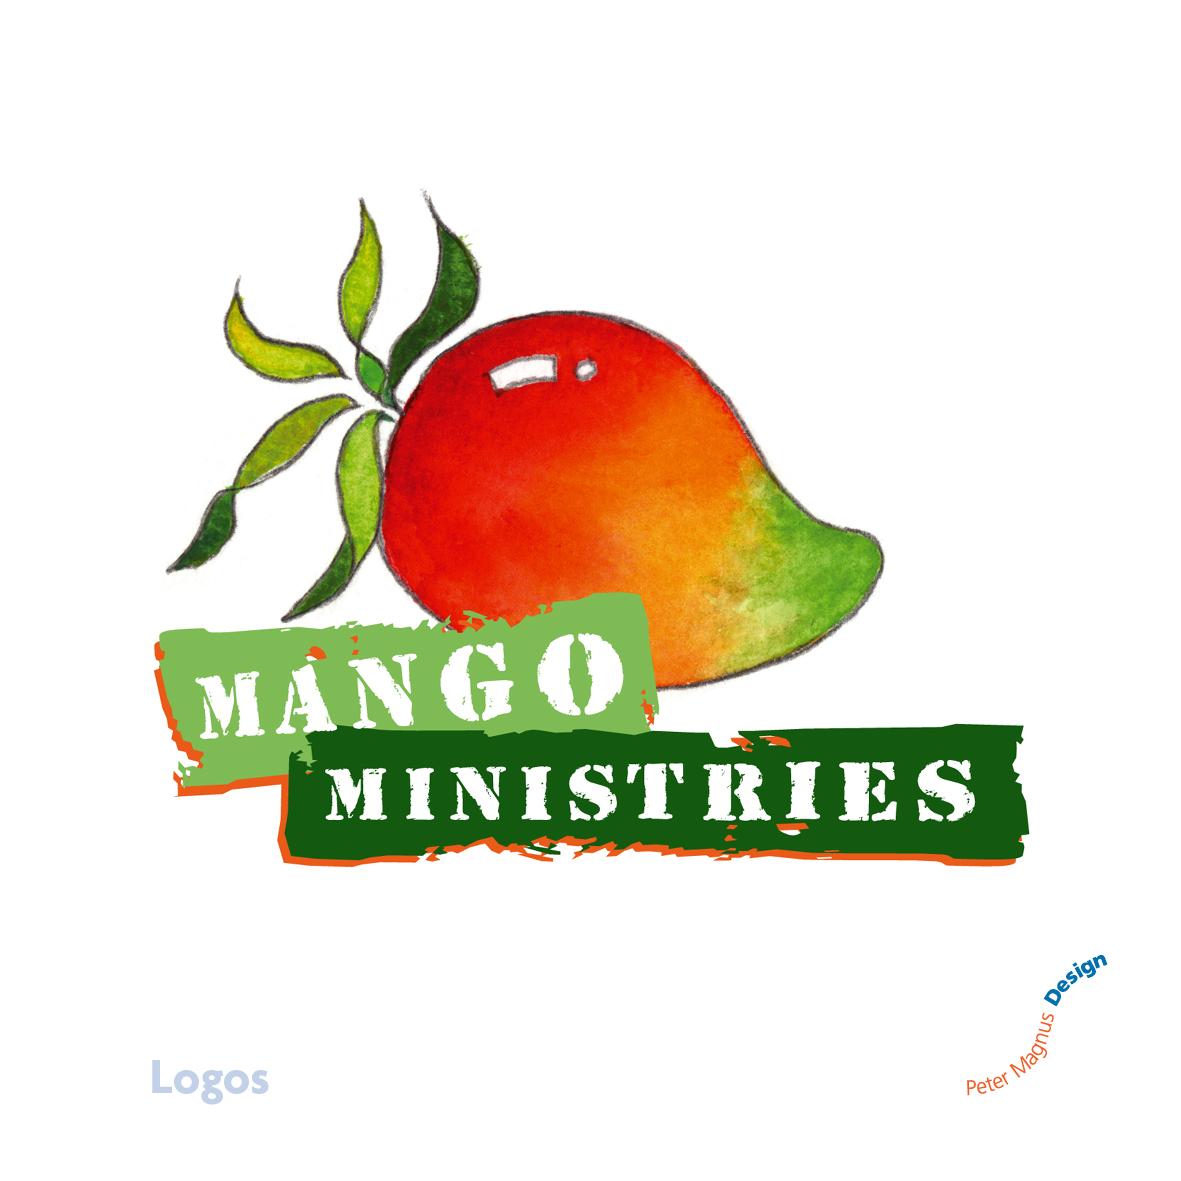 Mango Ministries logo, Watford